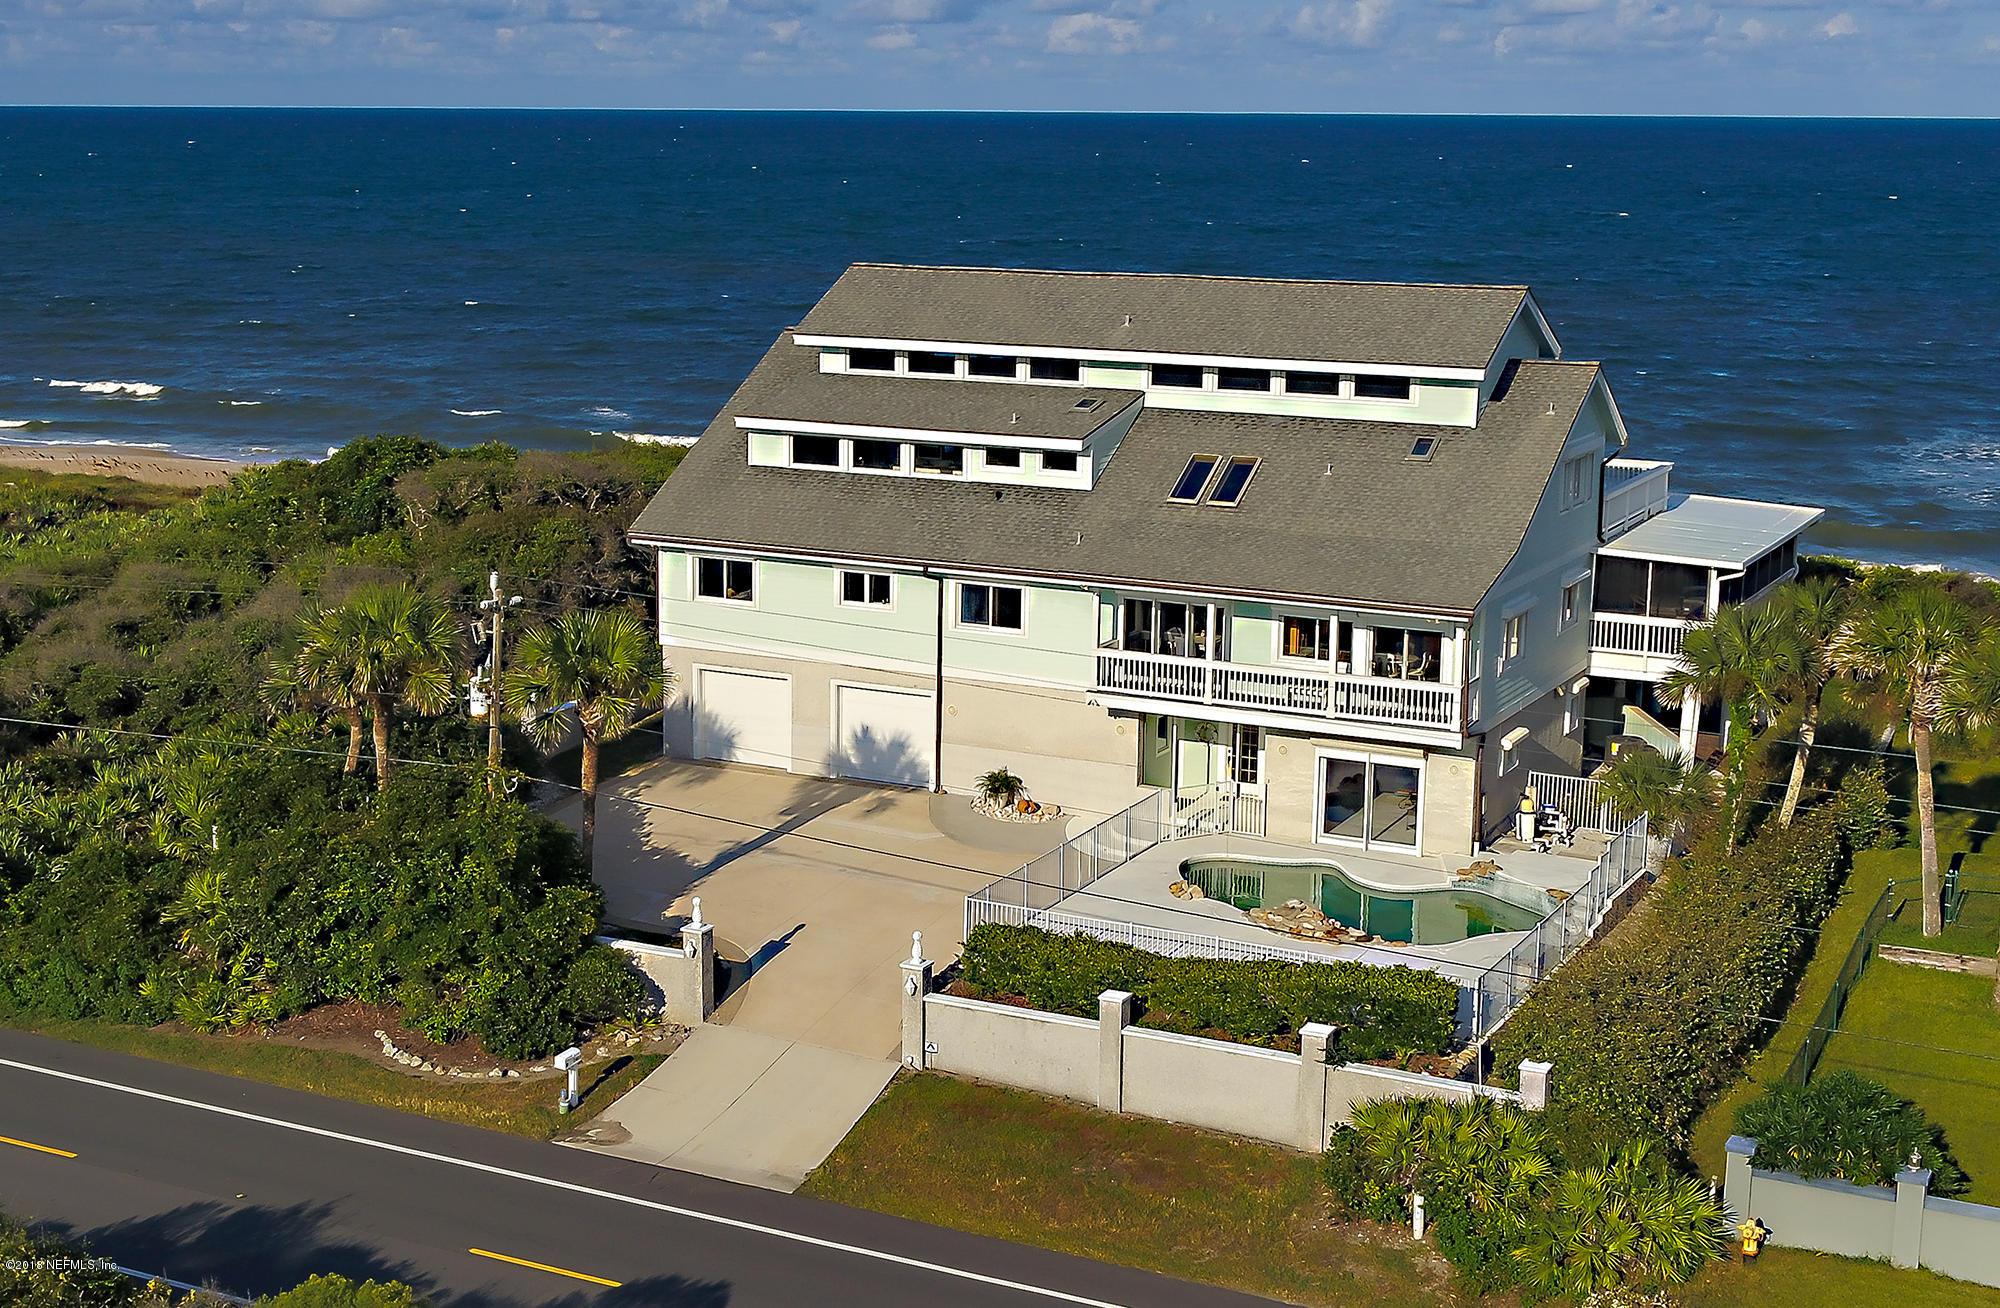 2403 PONTE VEDRA, PONTE VEDRA BEACH, FLORIDA 32082, 6 Bedrooms Bedrooms, ,5 BathroomsBathrooms,Residential - single family,For sale,PONTE VEDRA,959736